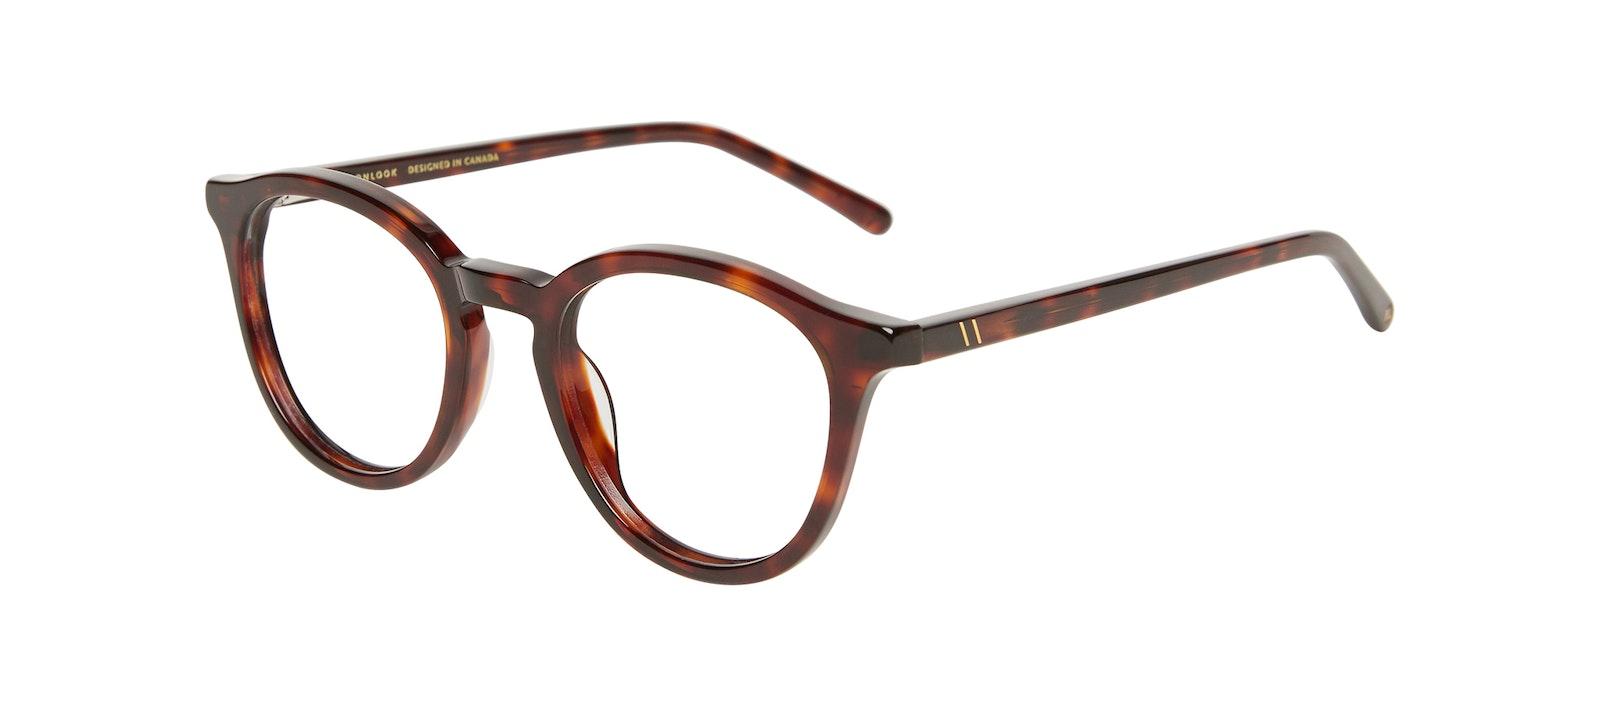 Affordable Fashion Glasses Round Eyeglasses Kids Gent Junior Tortoise Tilt